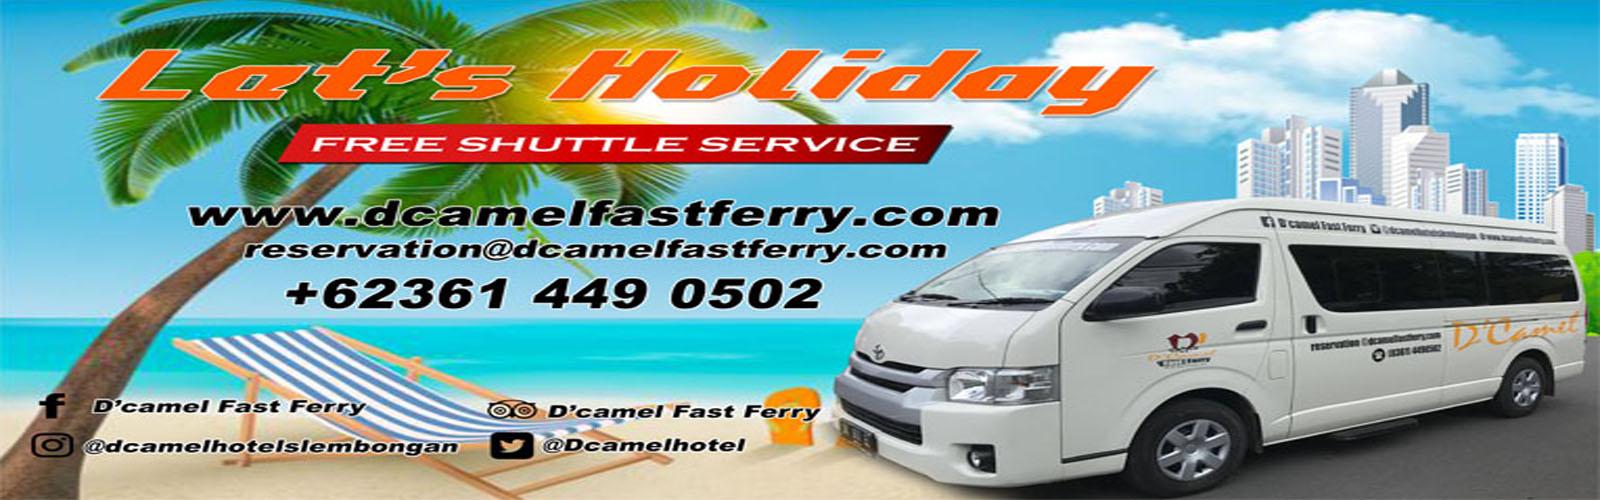 D'camel Fast Ferry